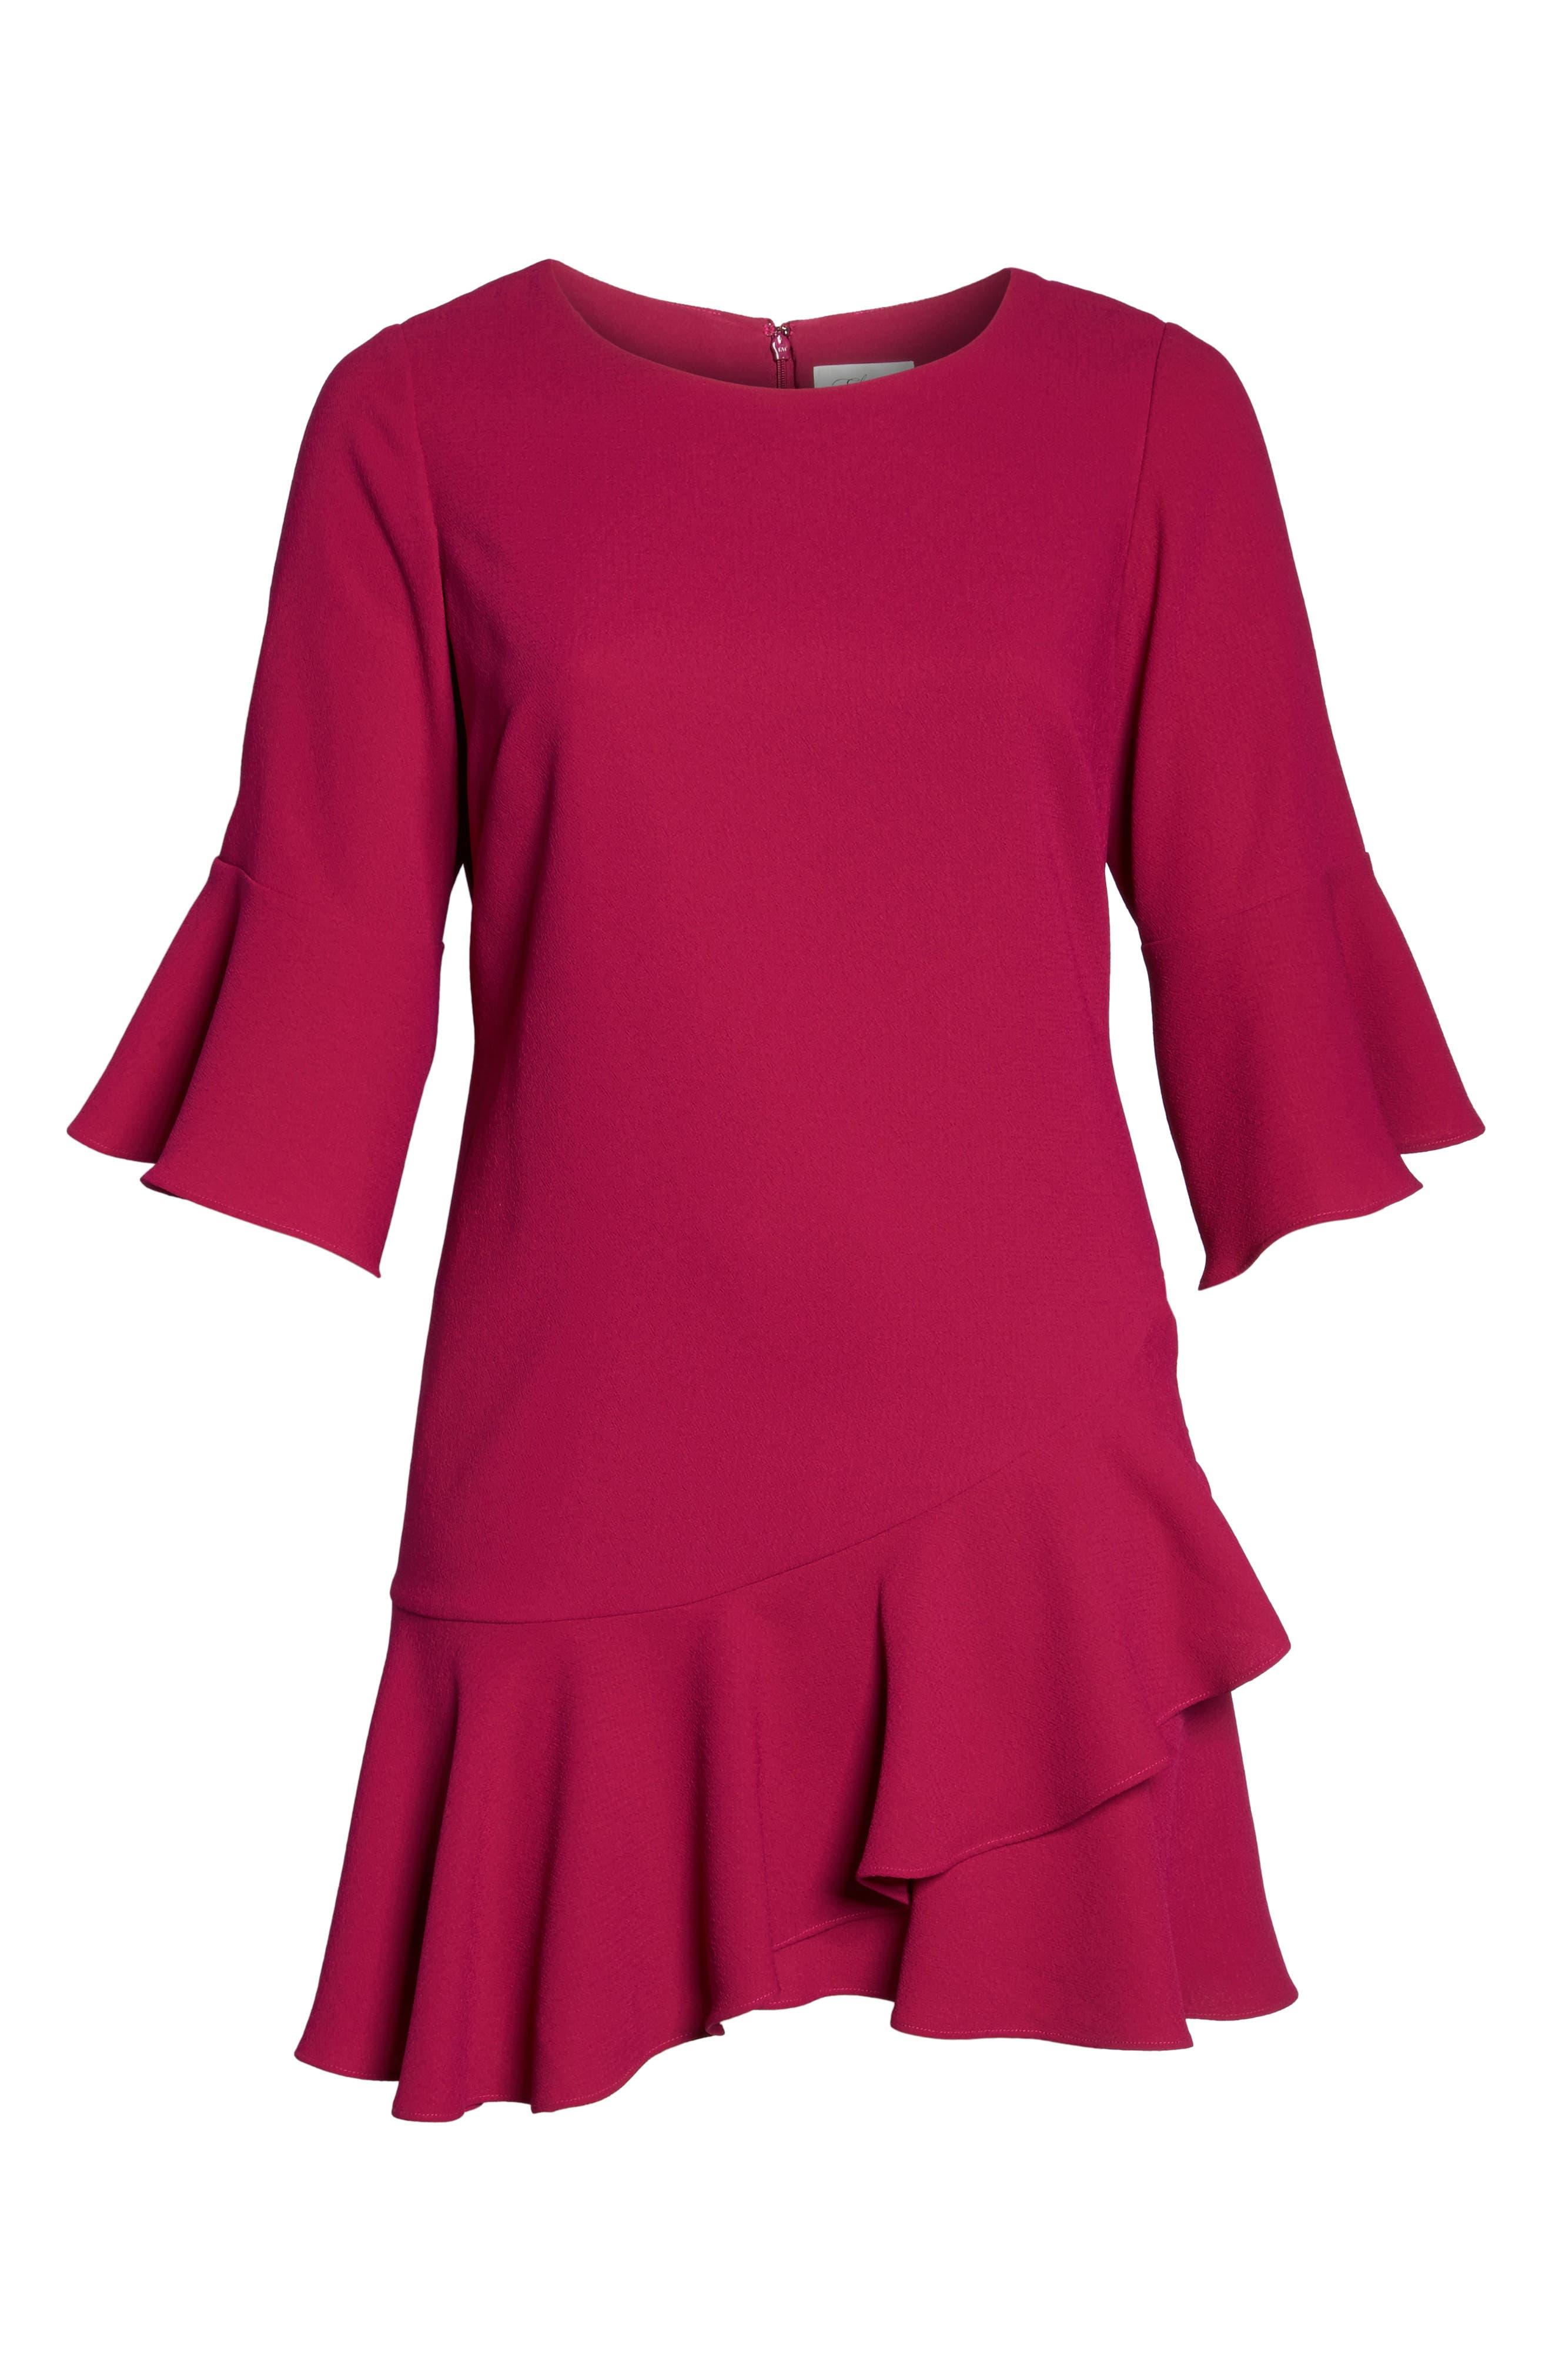 Ruffled Flounce A-Line Dress,                             Alternate thumbnail 6, color,                             678